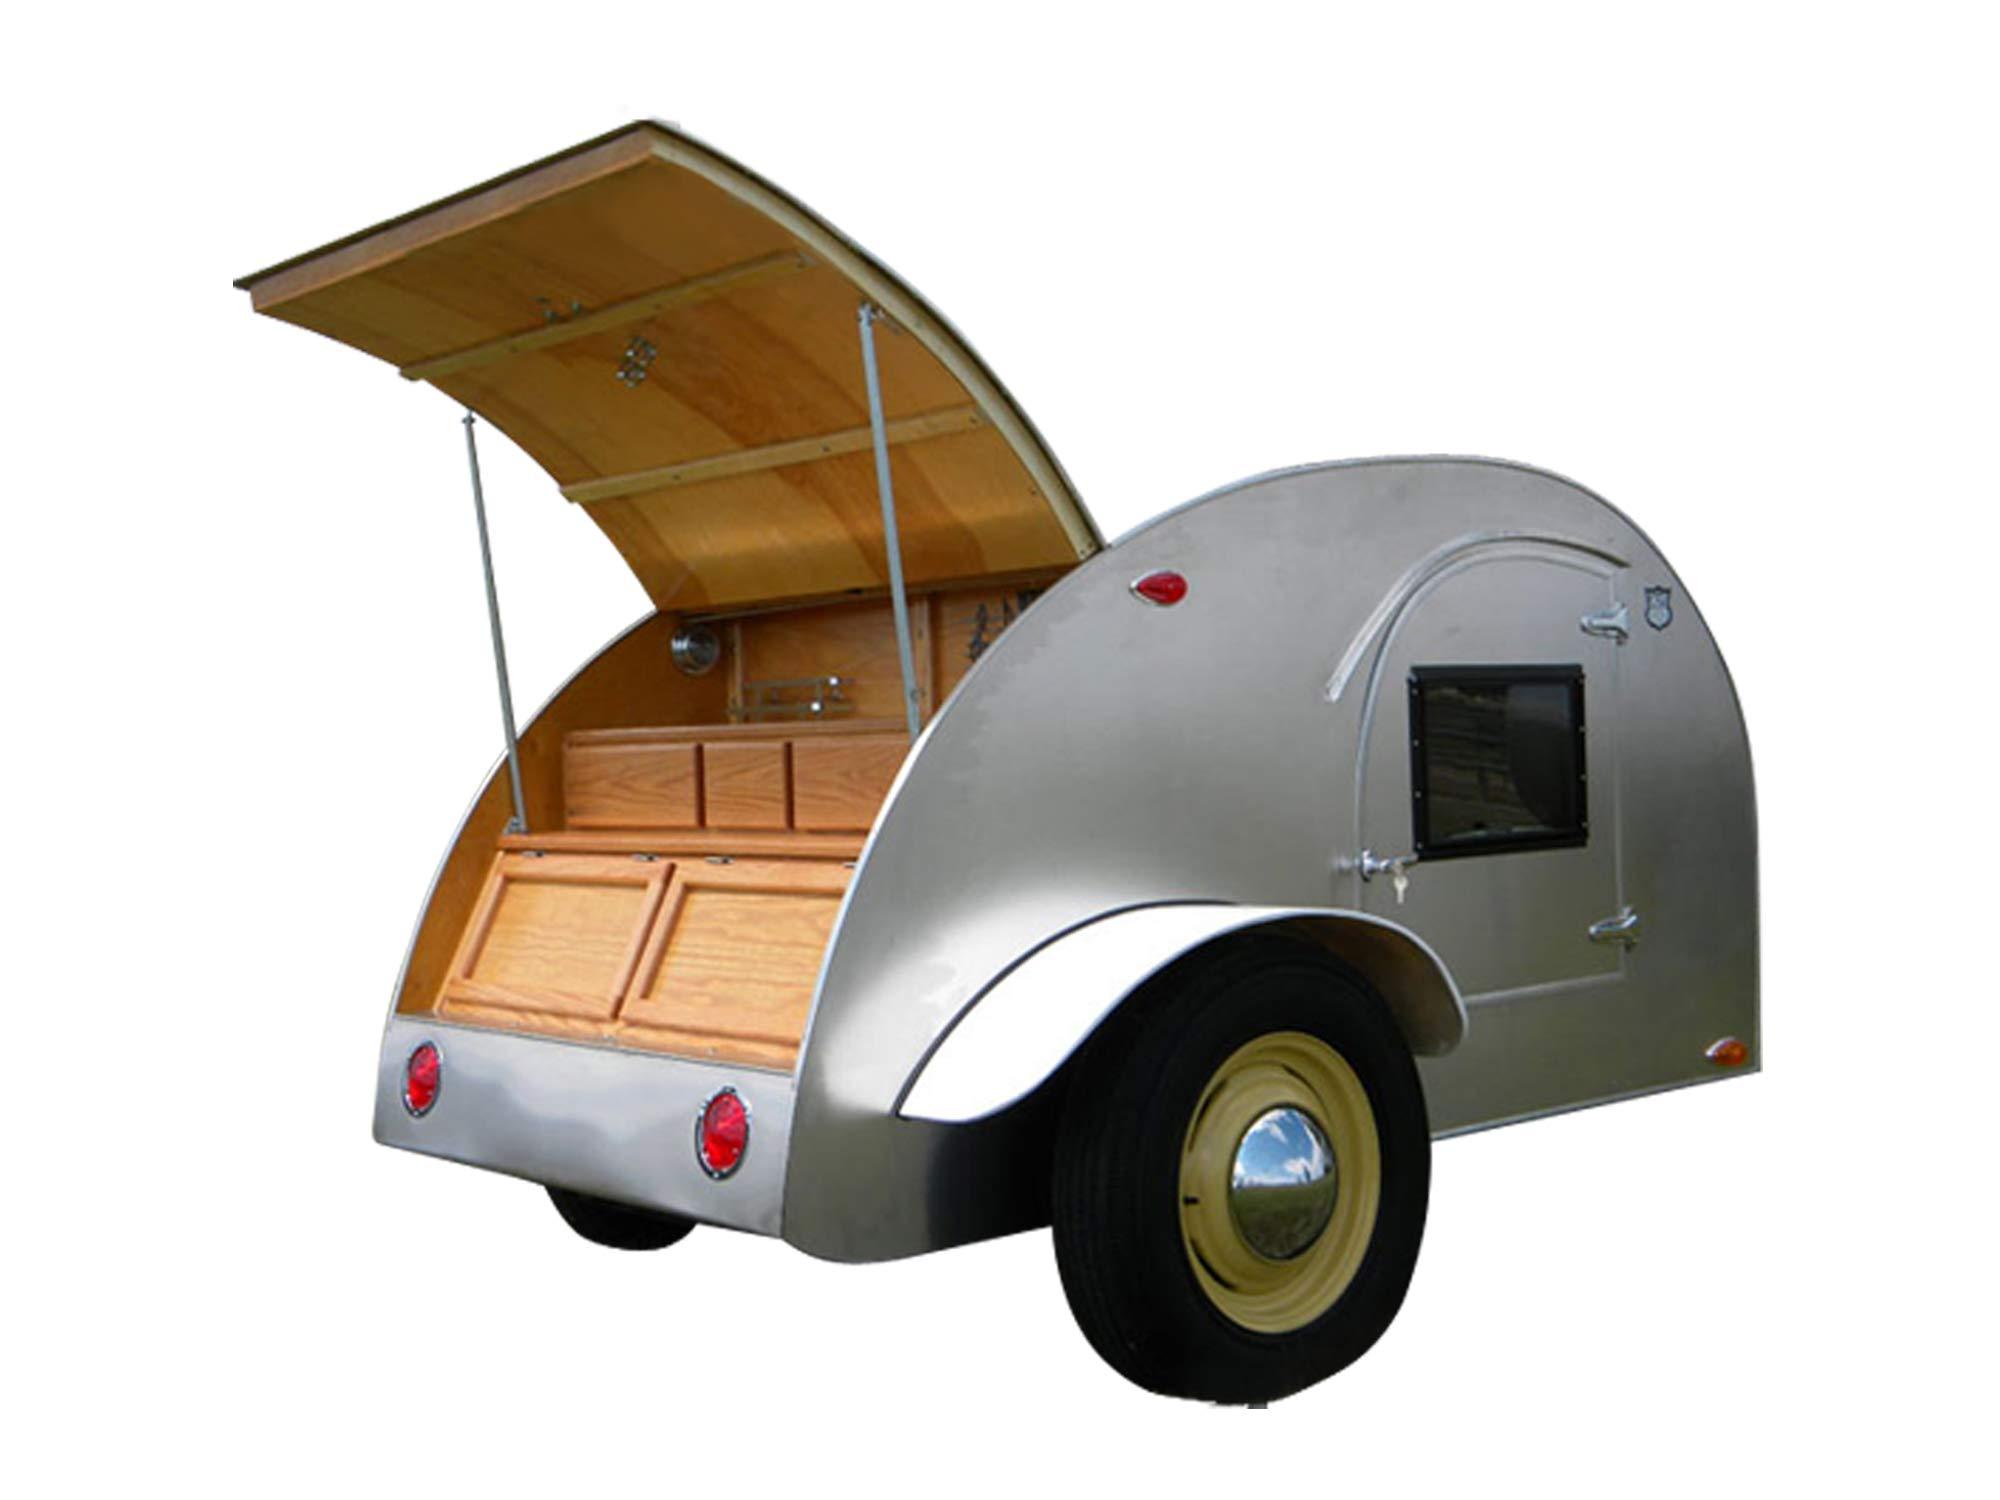 8' Teardrop Camper Trailer DIY Plans Tear Drop Vintage Camper RV Build Your Own by DIY Plans